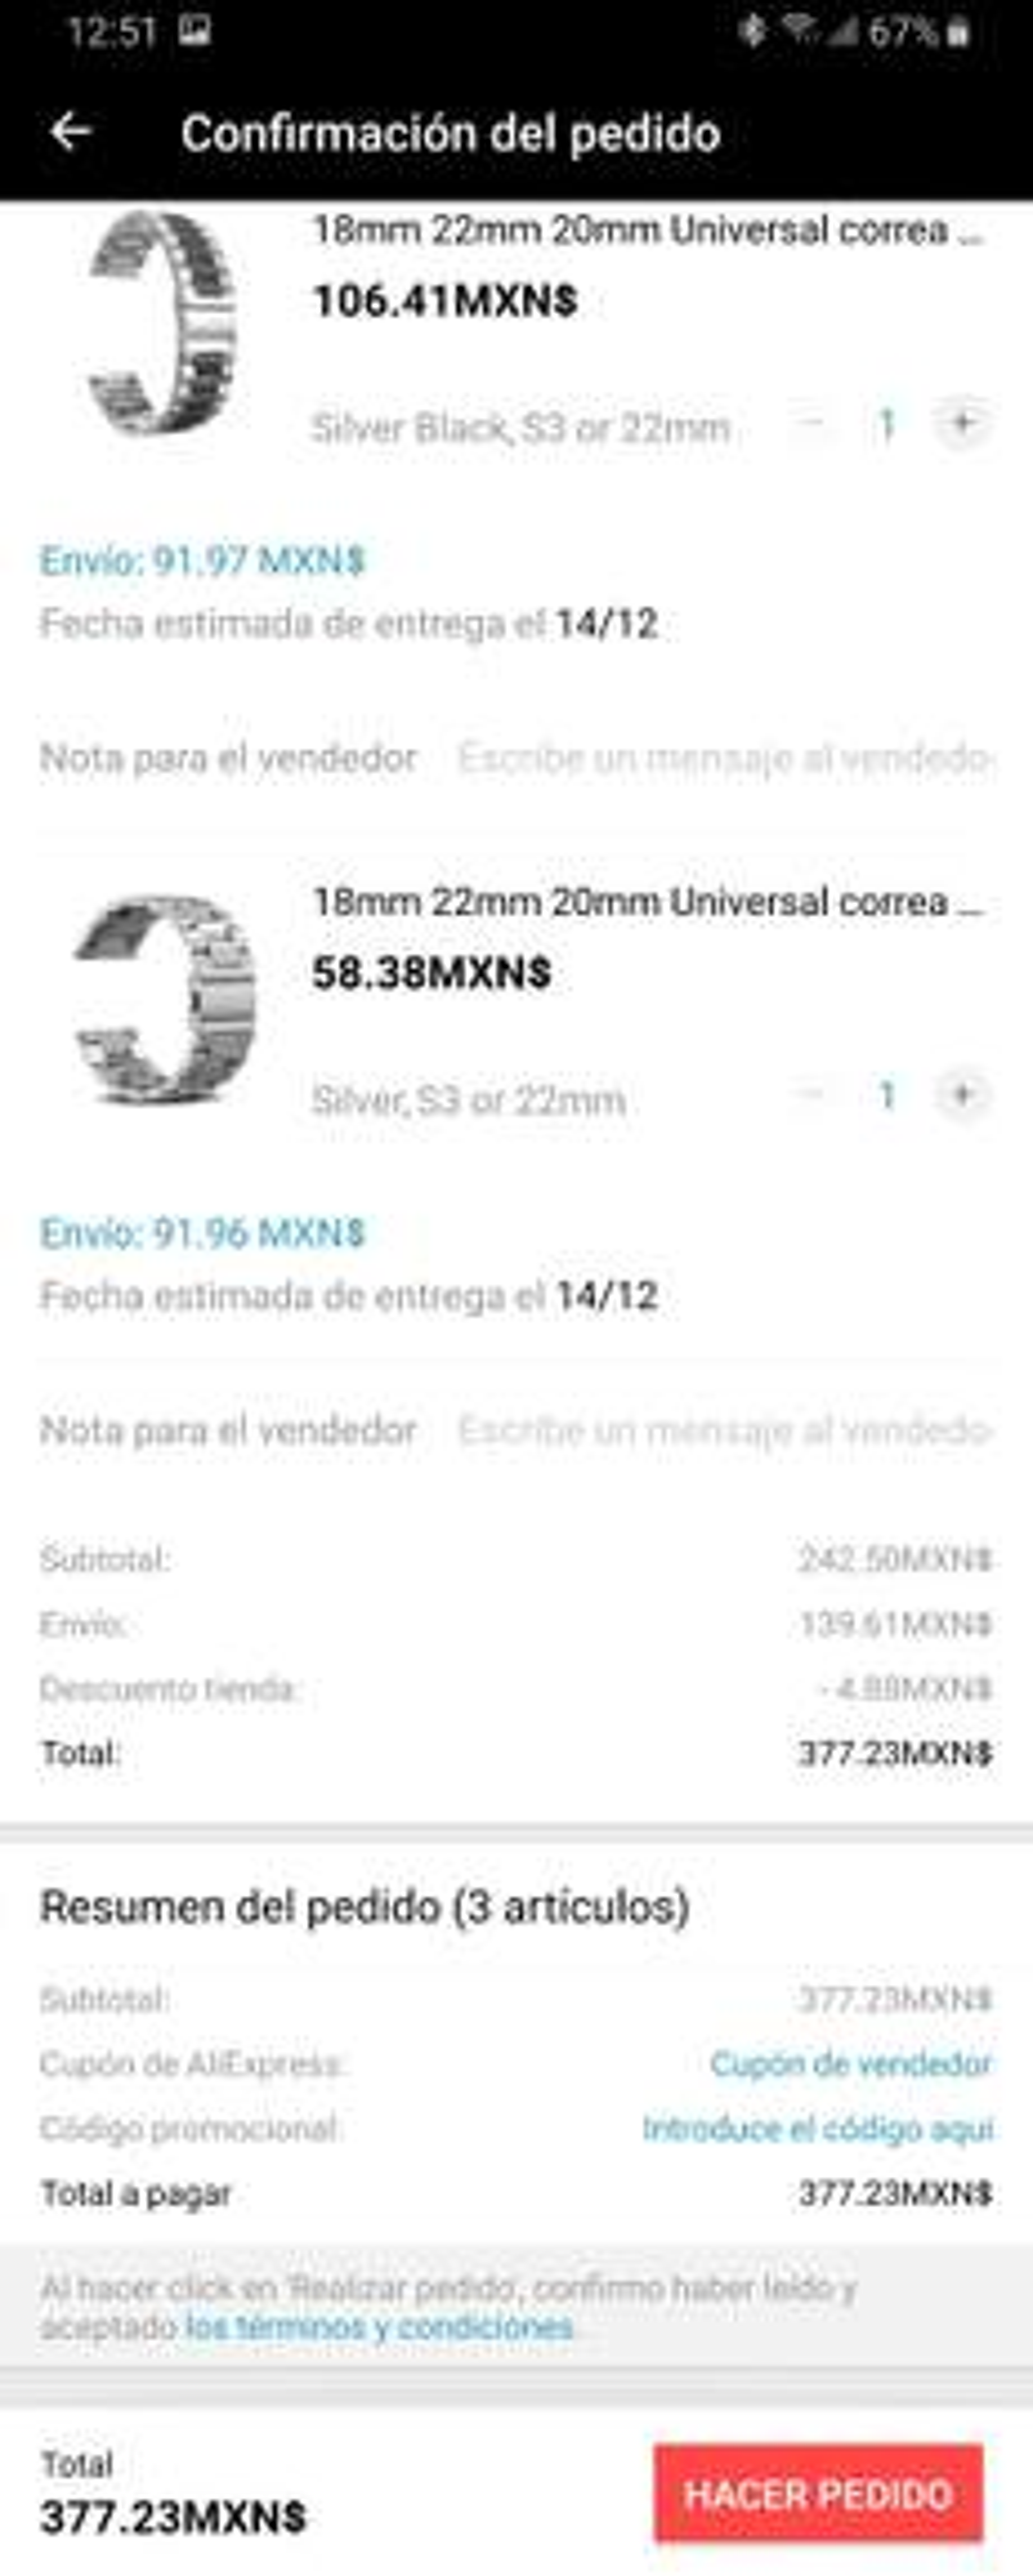 370858-sUOm8.jpg